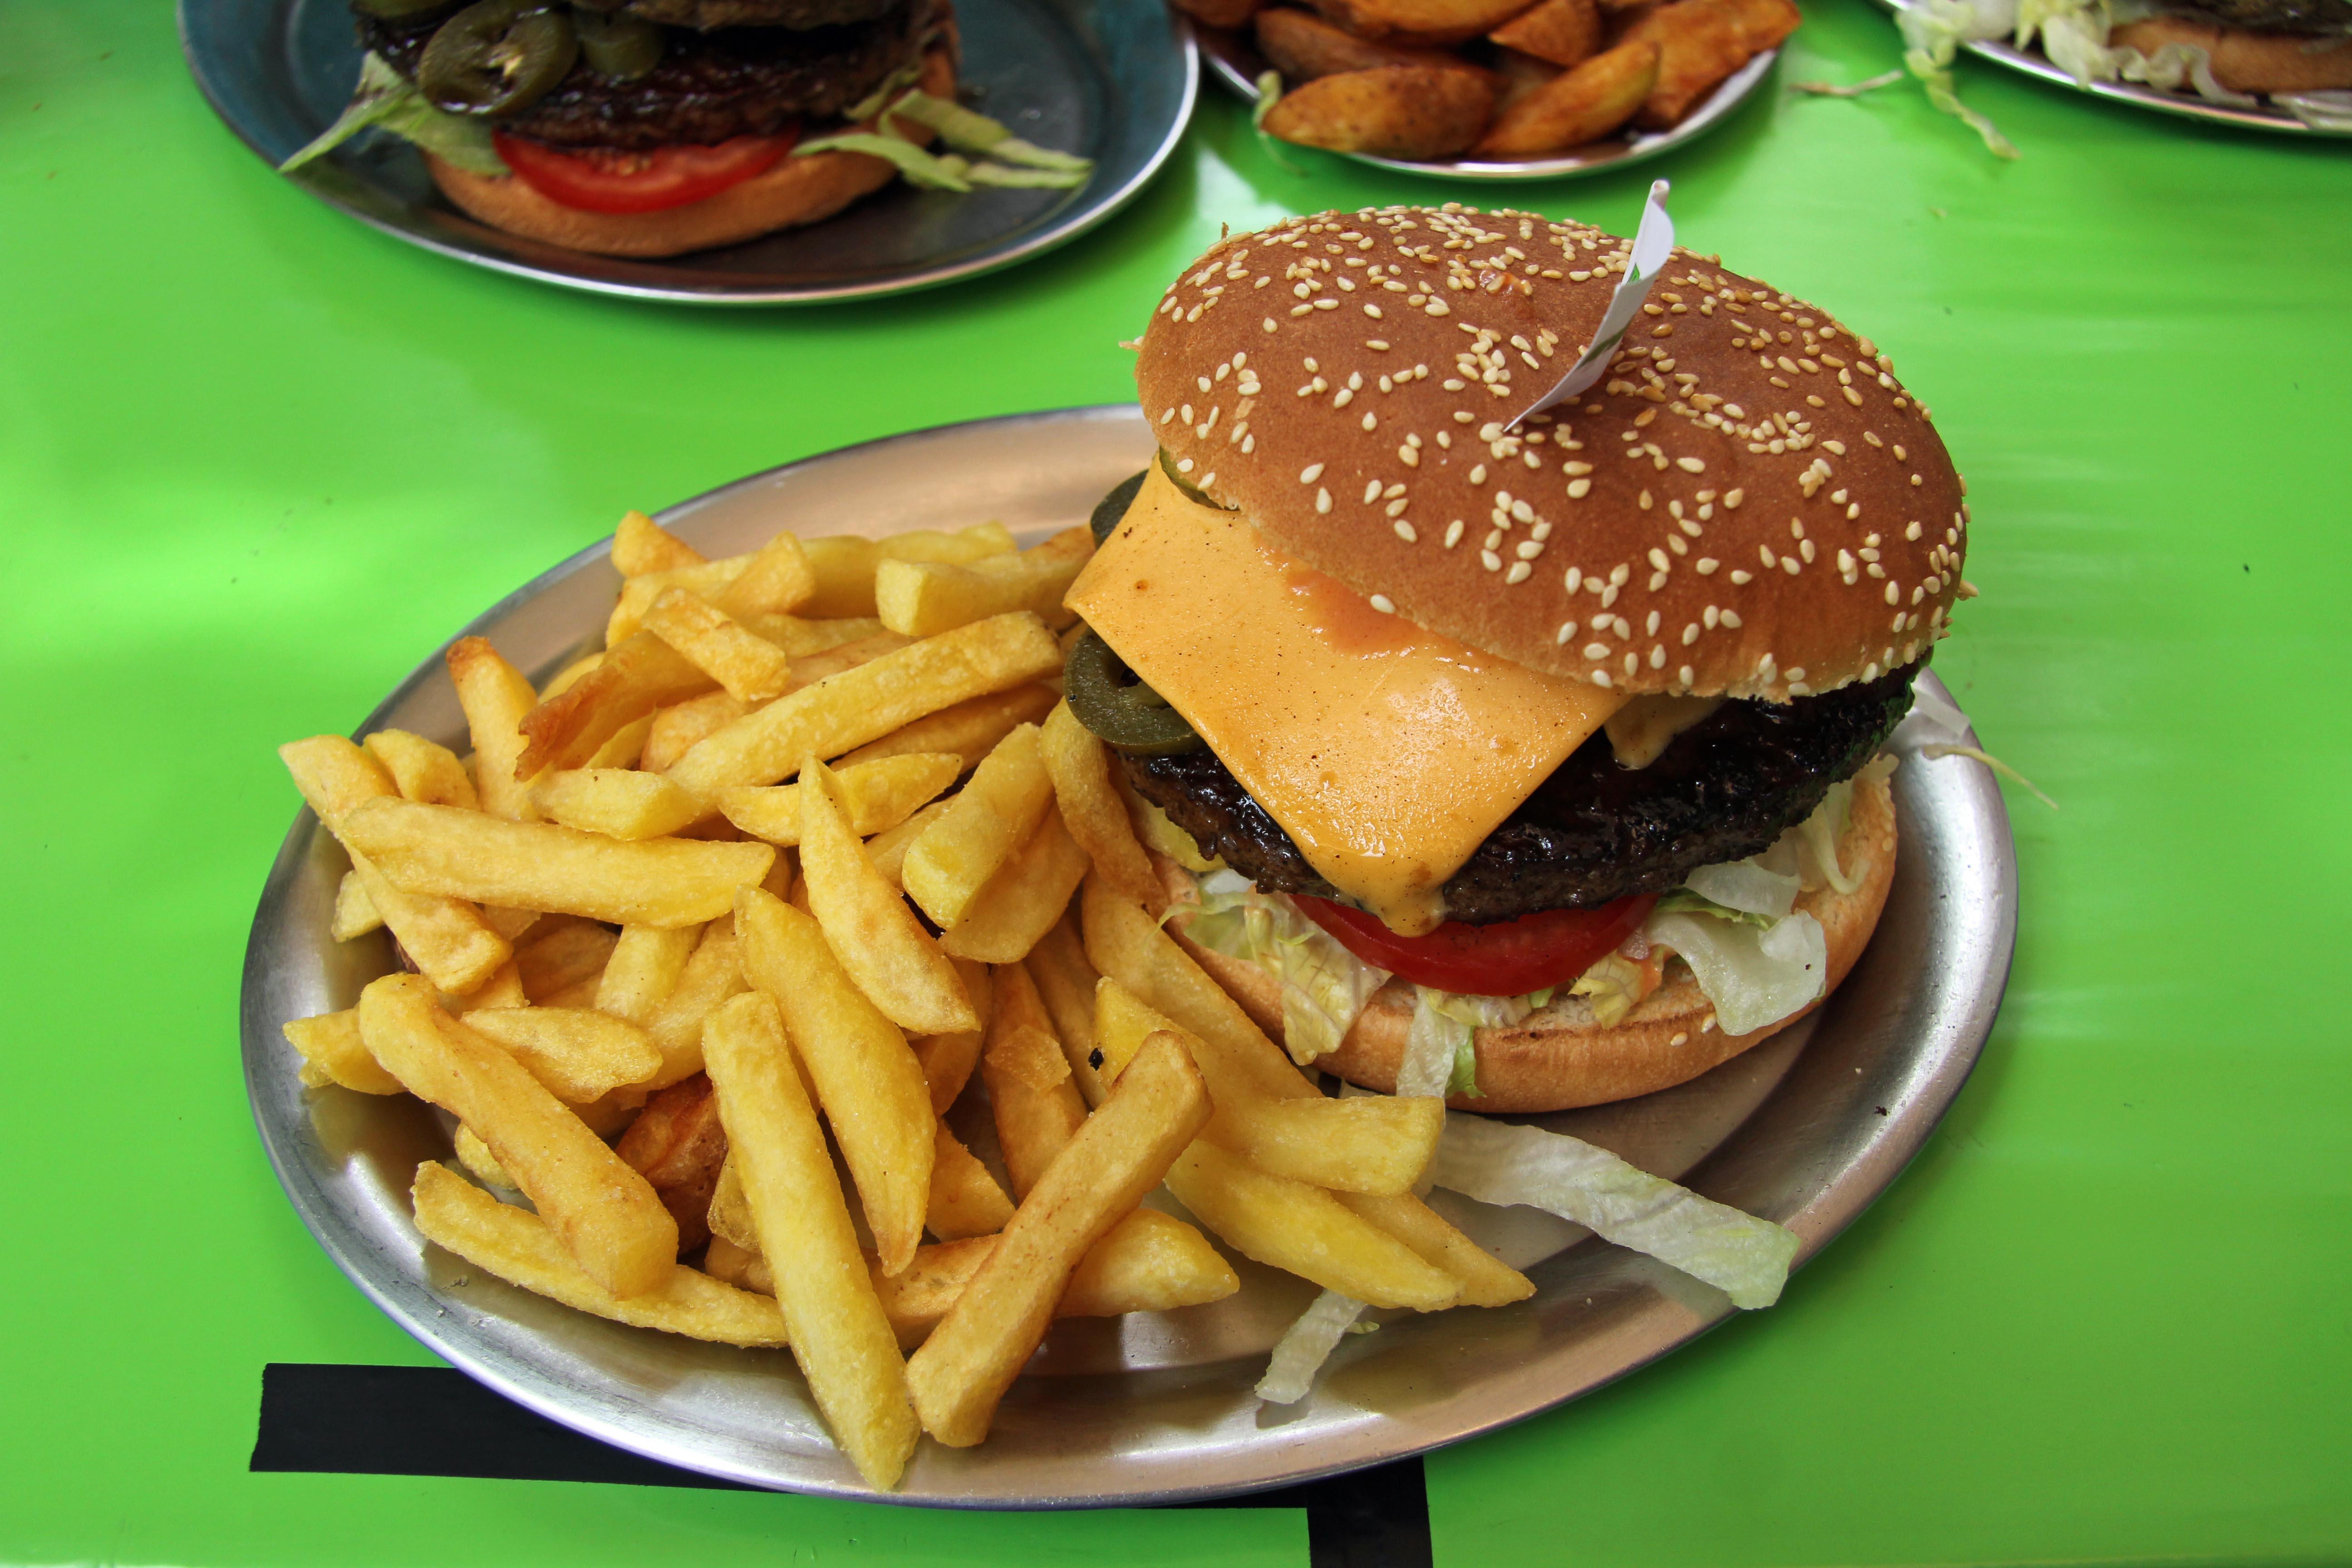 A Chilli Cheeseburger at Marienburger in Berlin